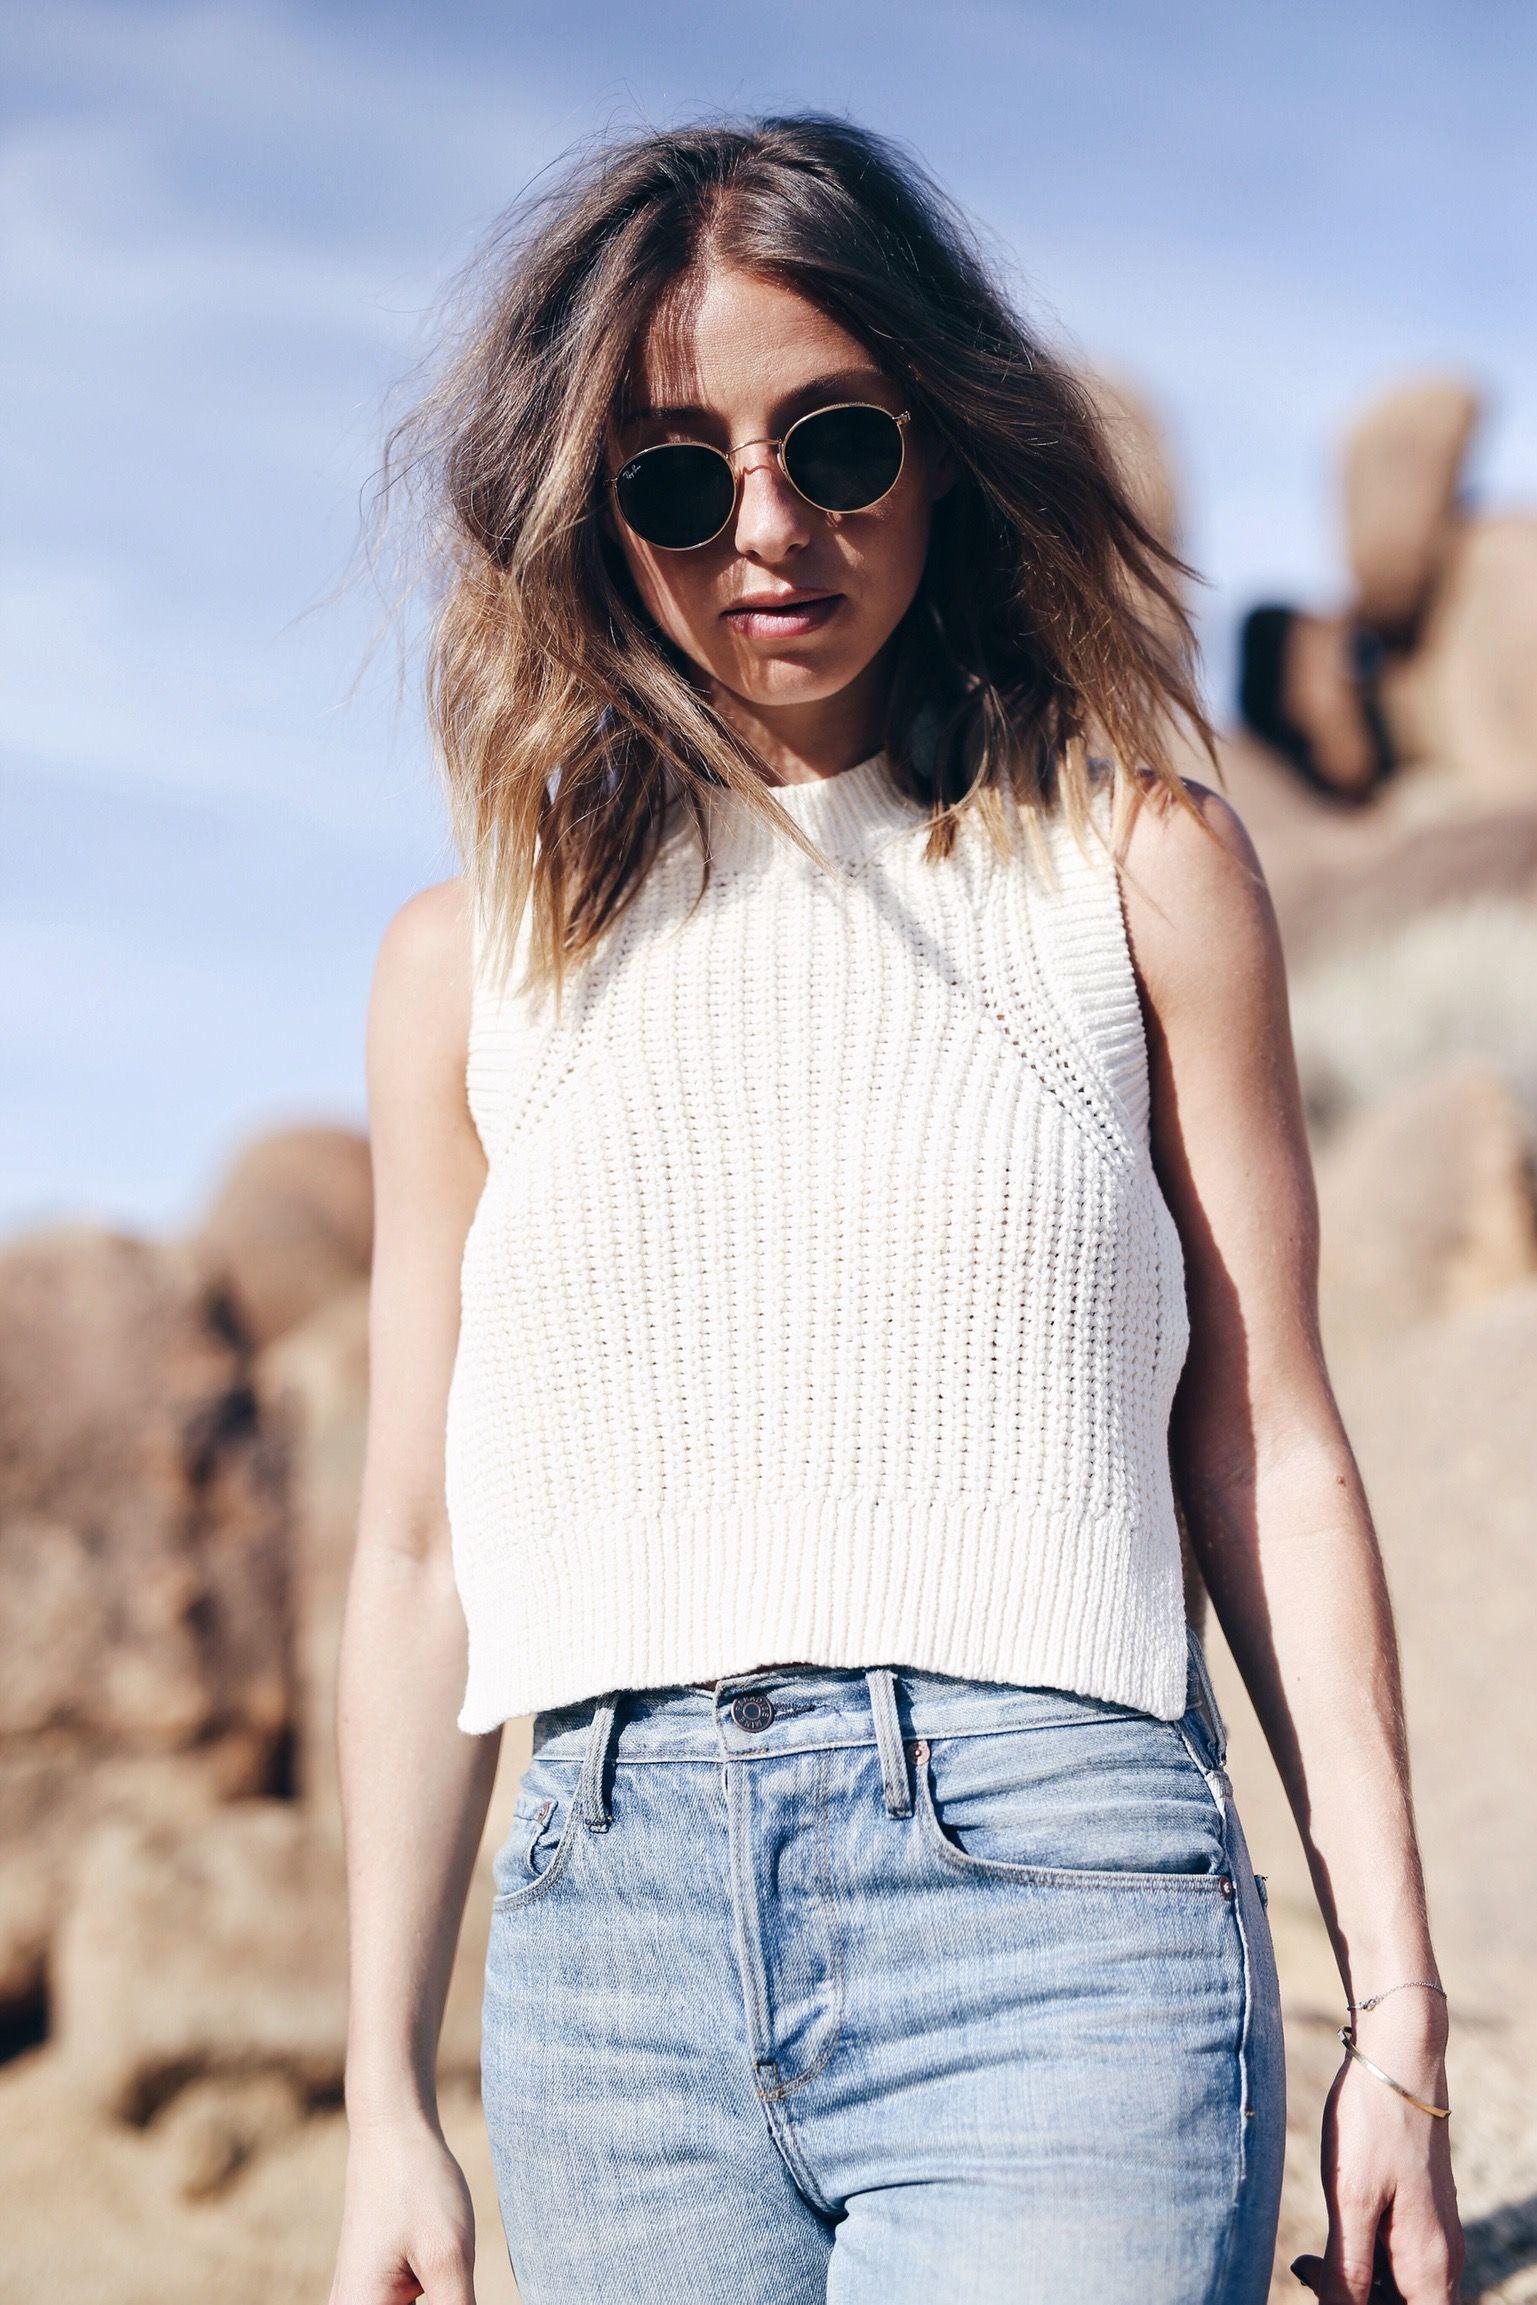 33b39540ed knit top in the desert  aritzia. knit top in the desert  aritzia Cropped  Sweater ...